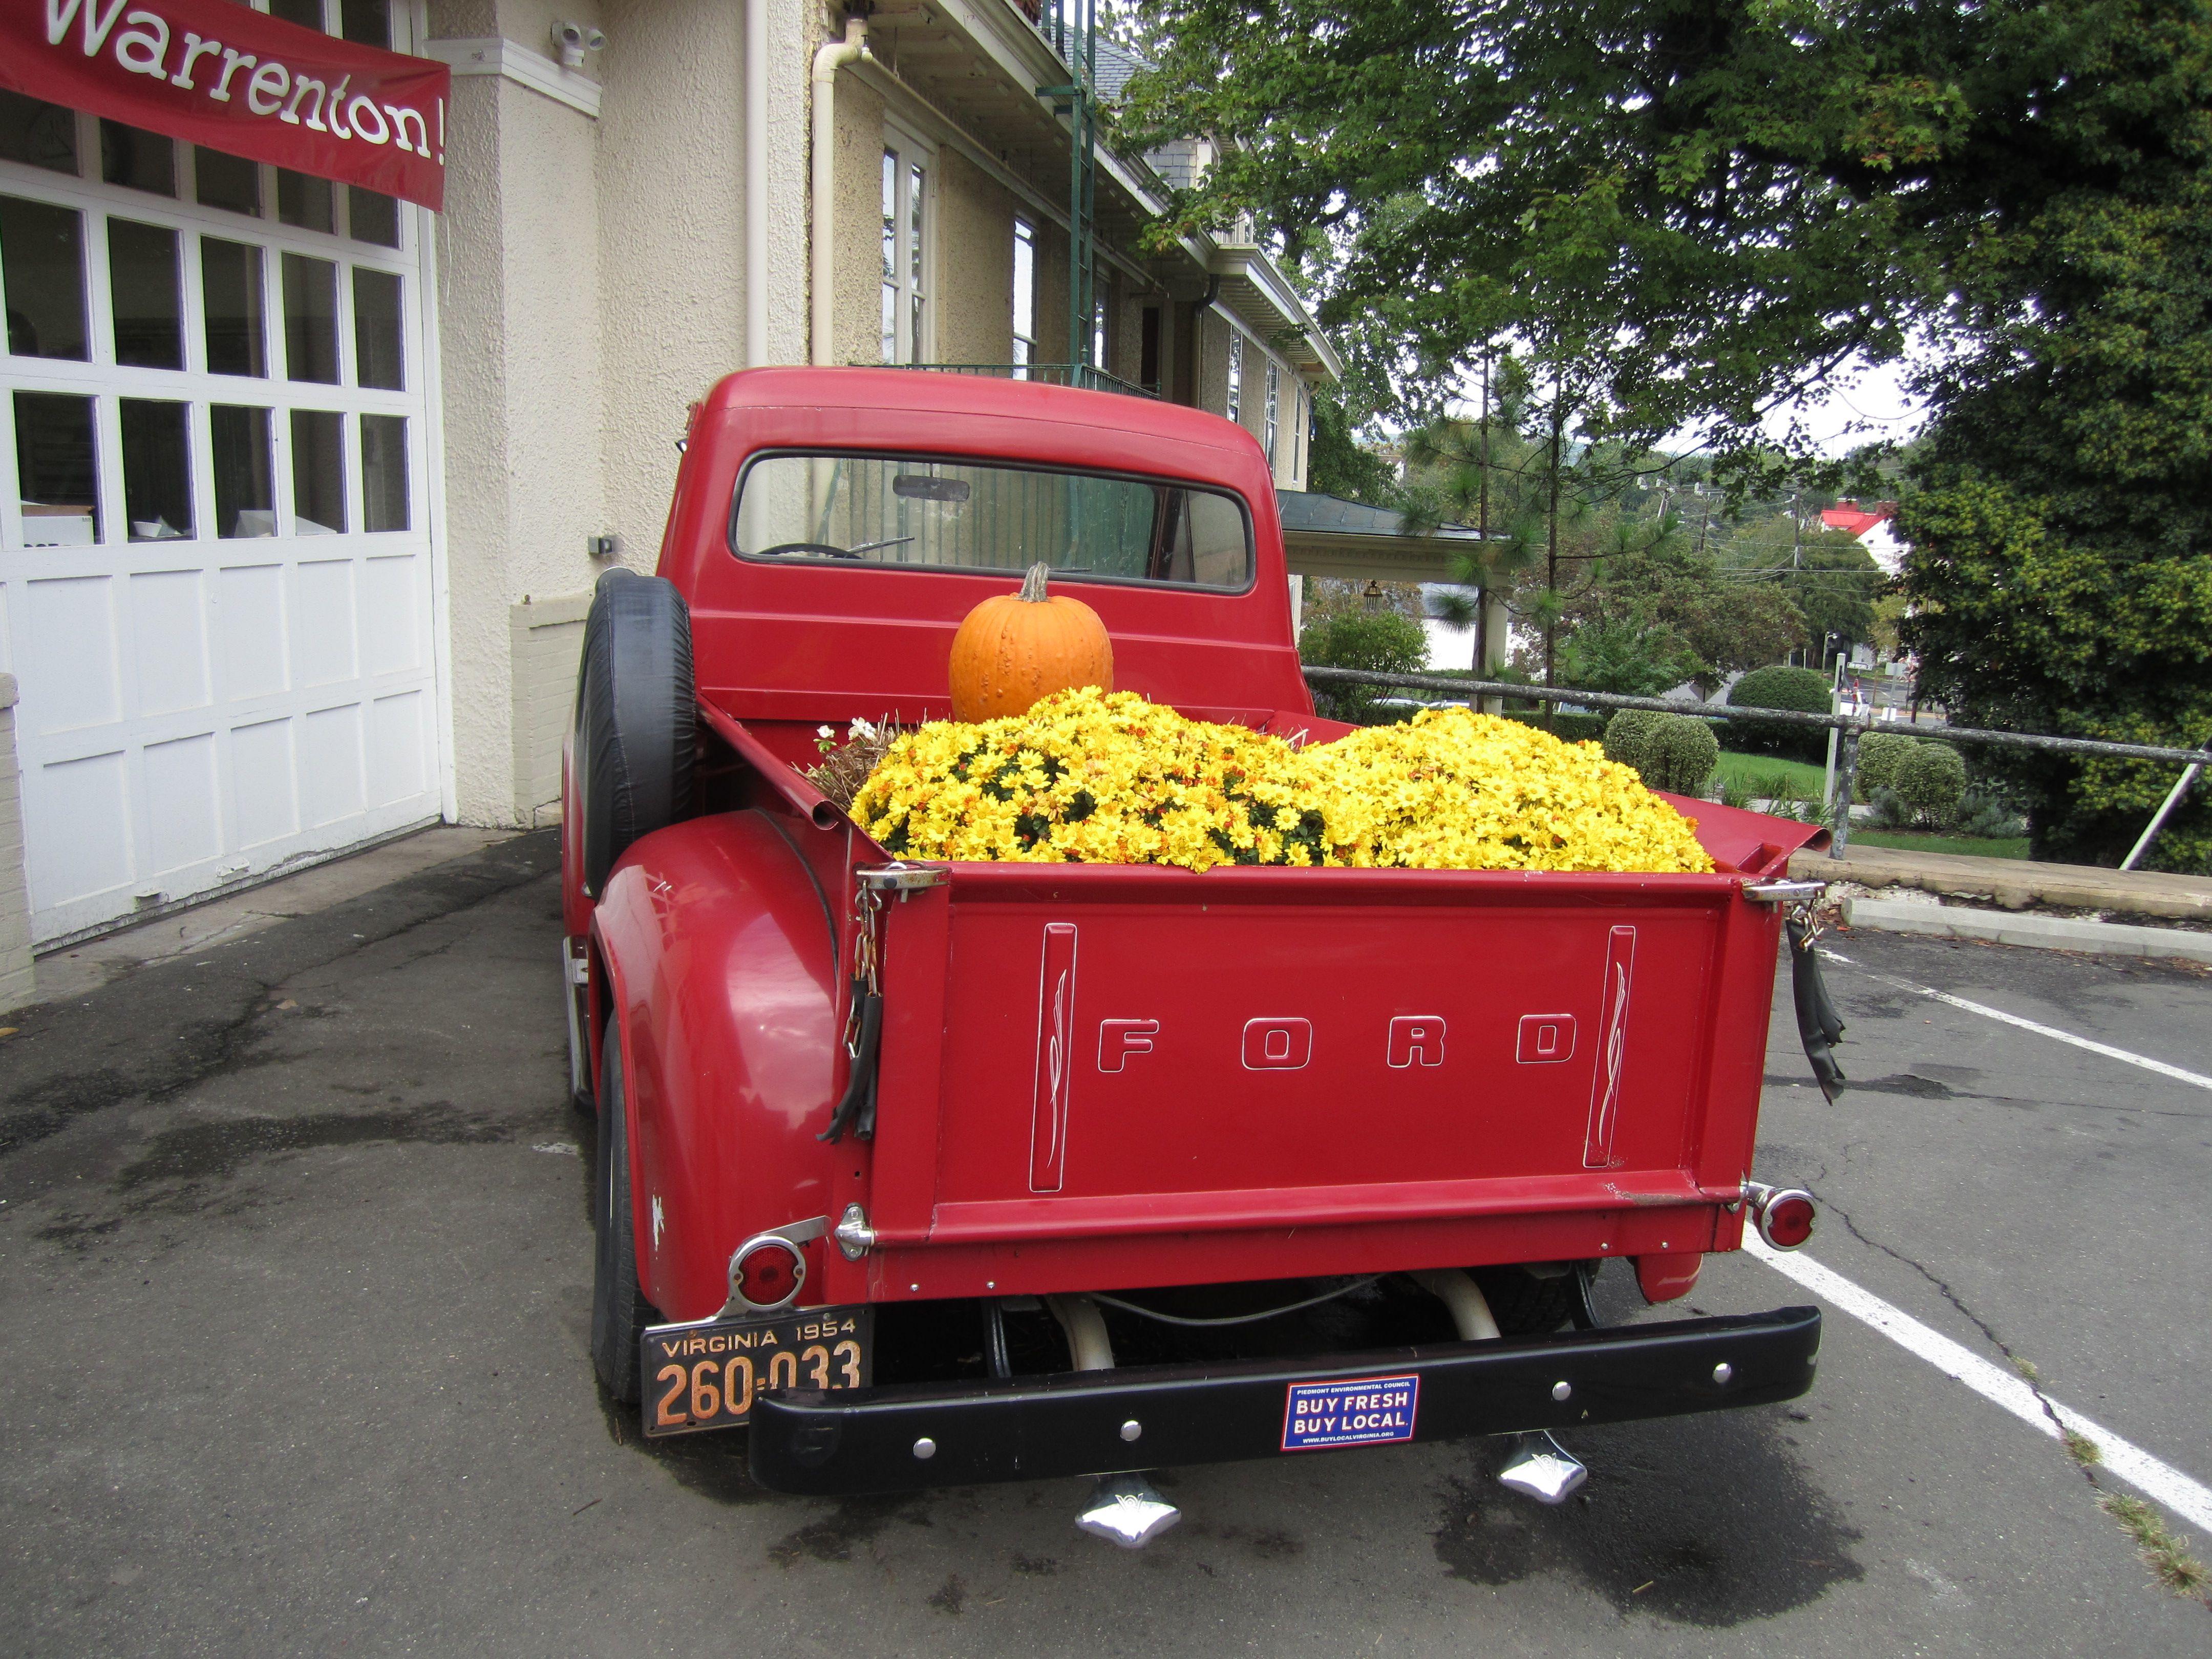 Old Red Truck Full Of Flowers I Want A 1950 Ford Someday Truett 1941 Grain